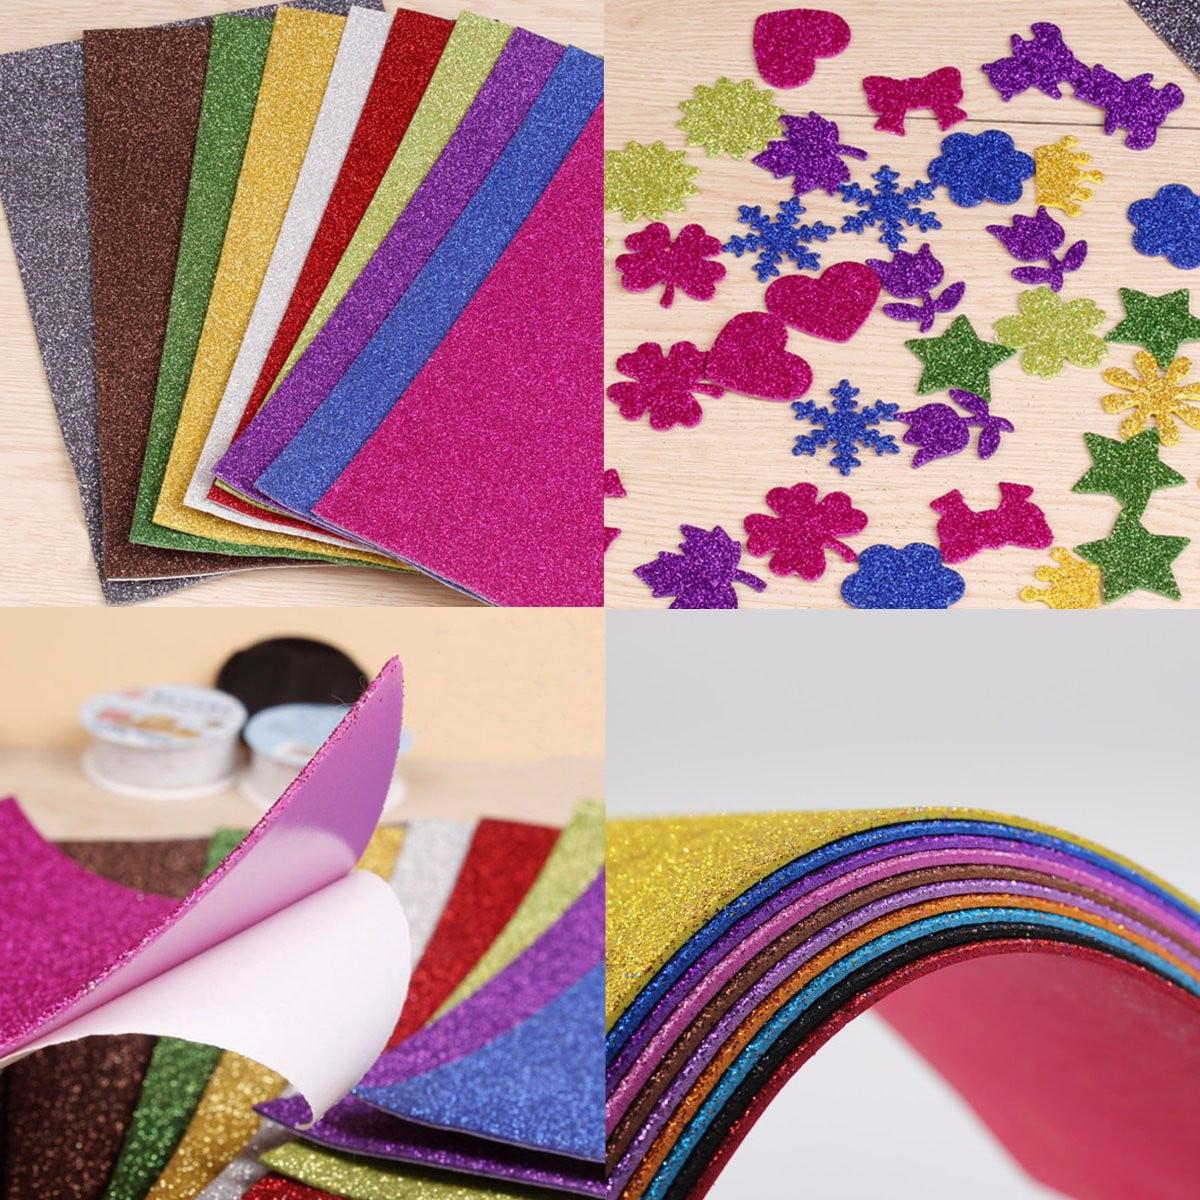 10pcs adhesive glitter scrapbooking paper vinyl sticker art sheets craft 8x12